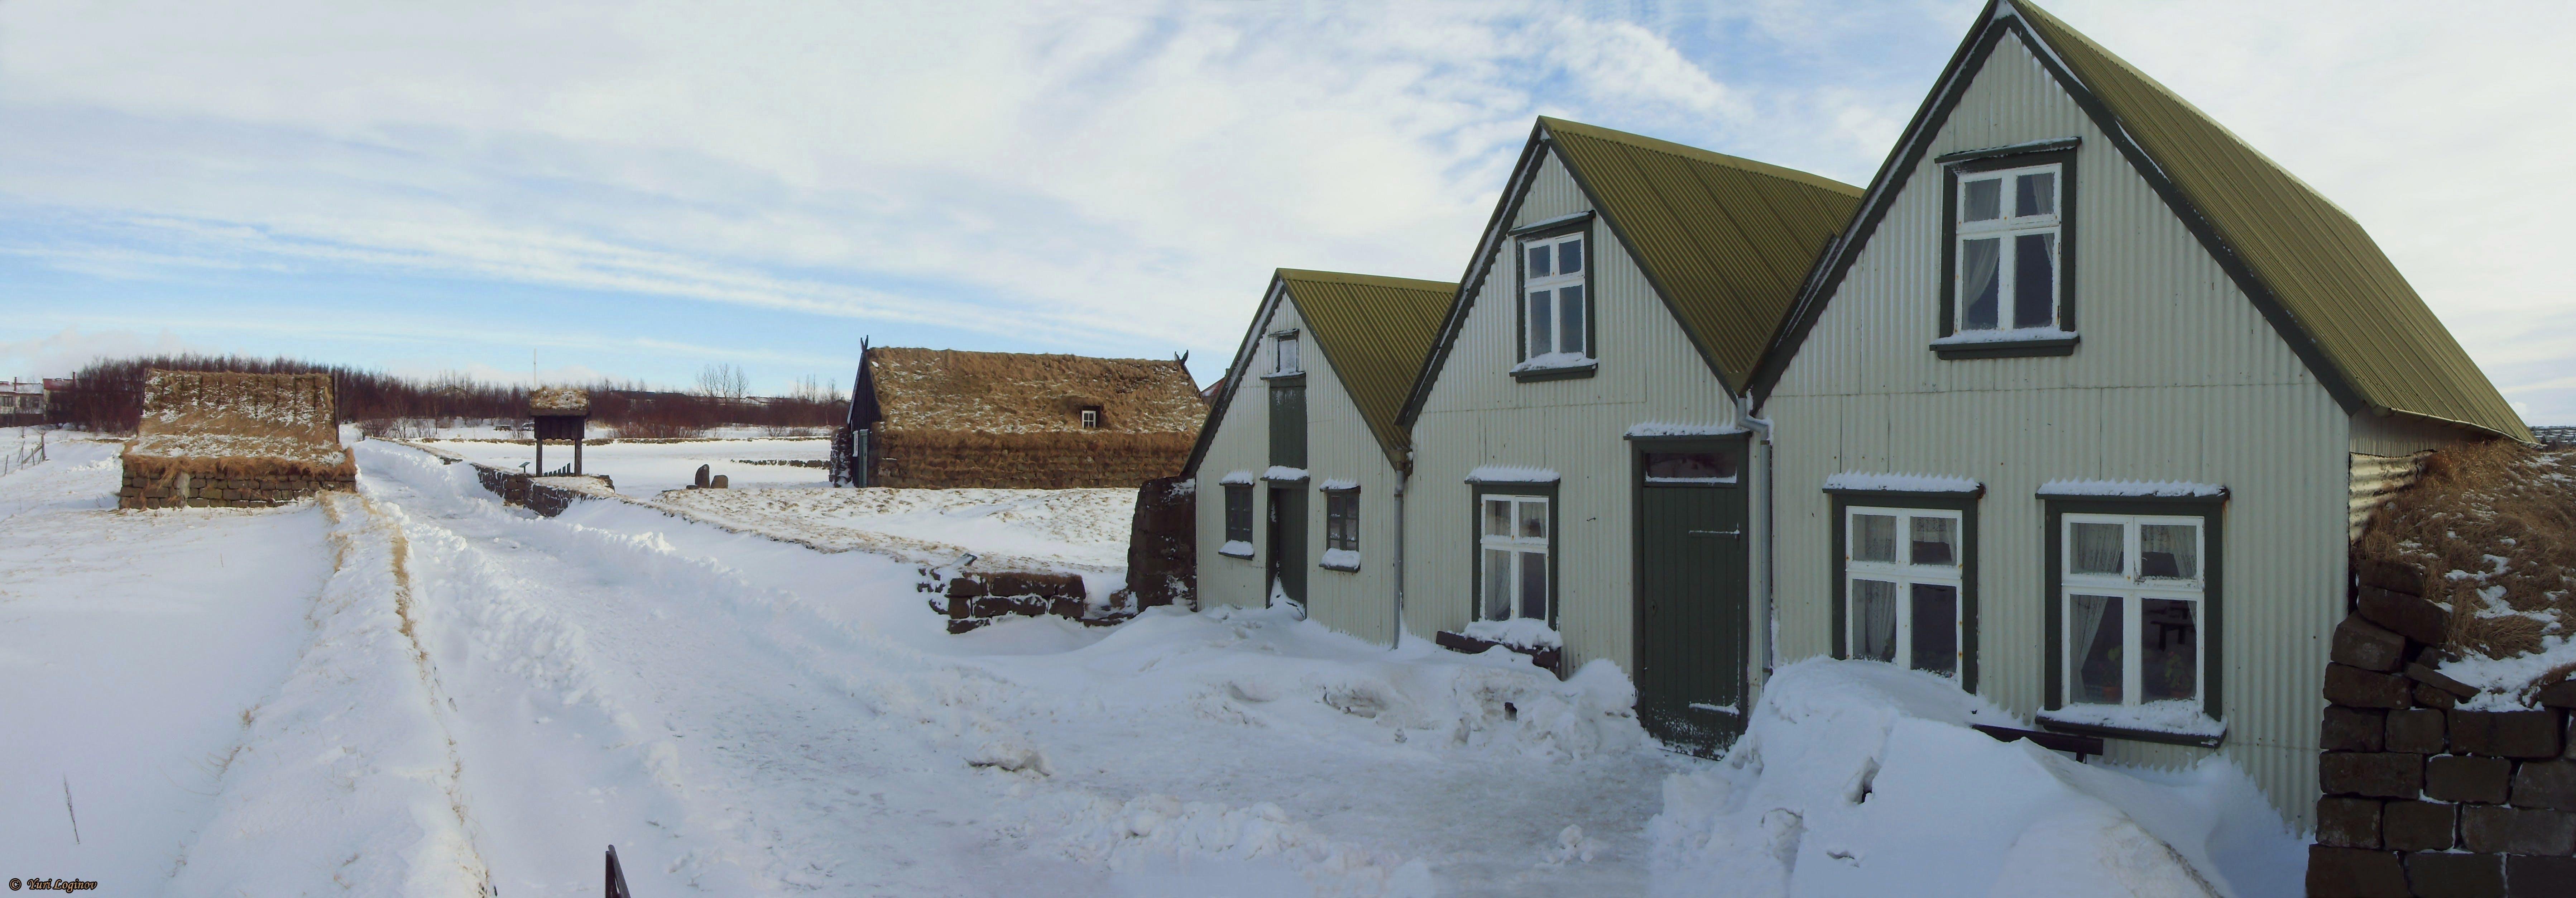 Free stock photo of iceland, island, reykjavik, Árbæjarsafn